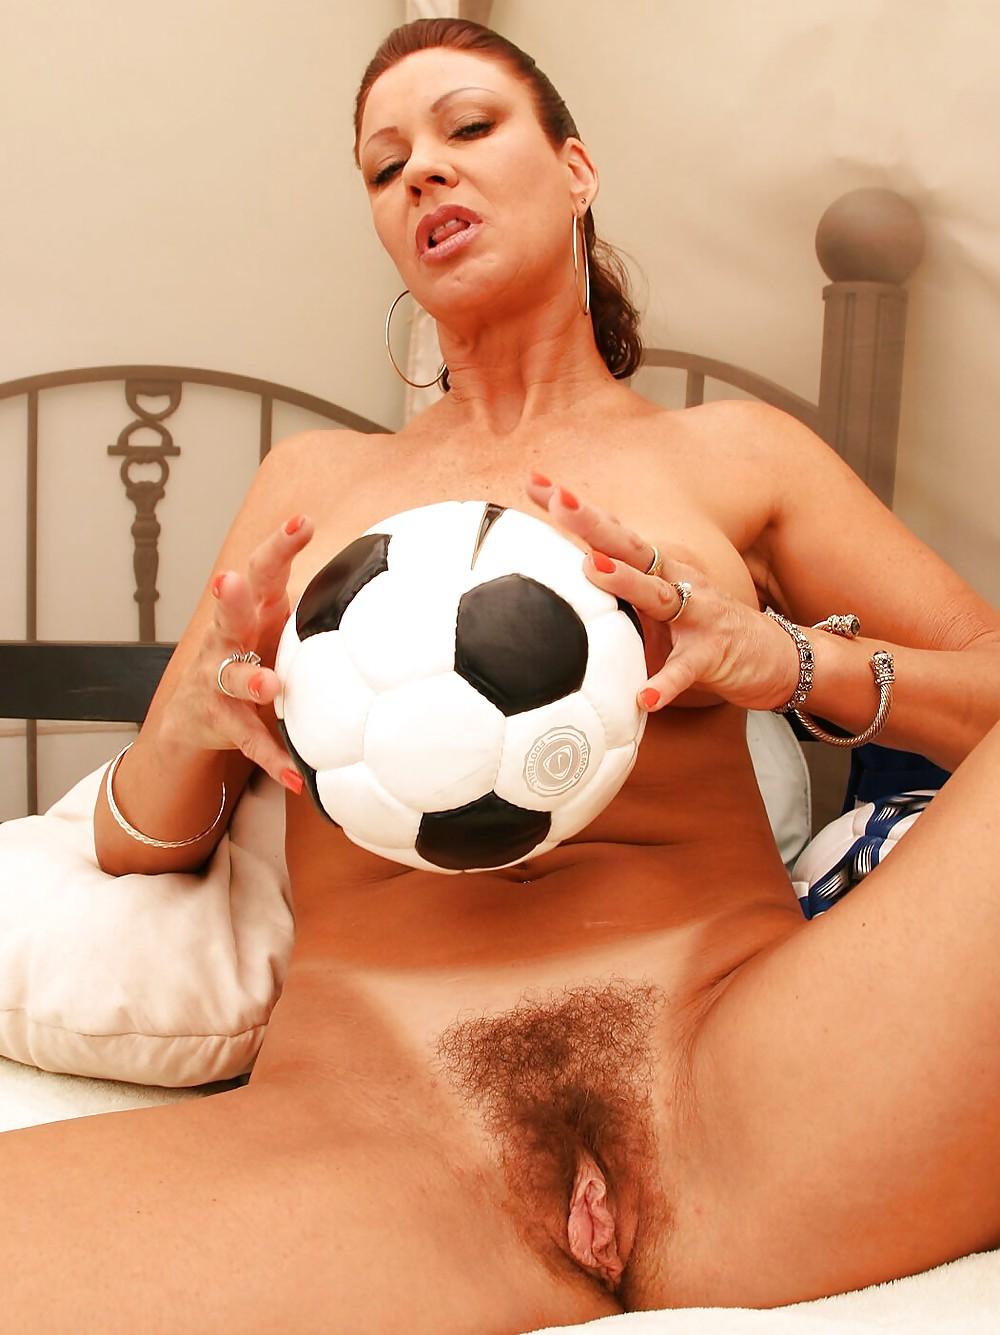 blonde-hot-nude-soccer-moms-jumbo-pussy